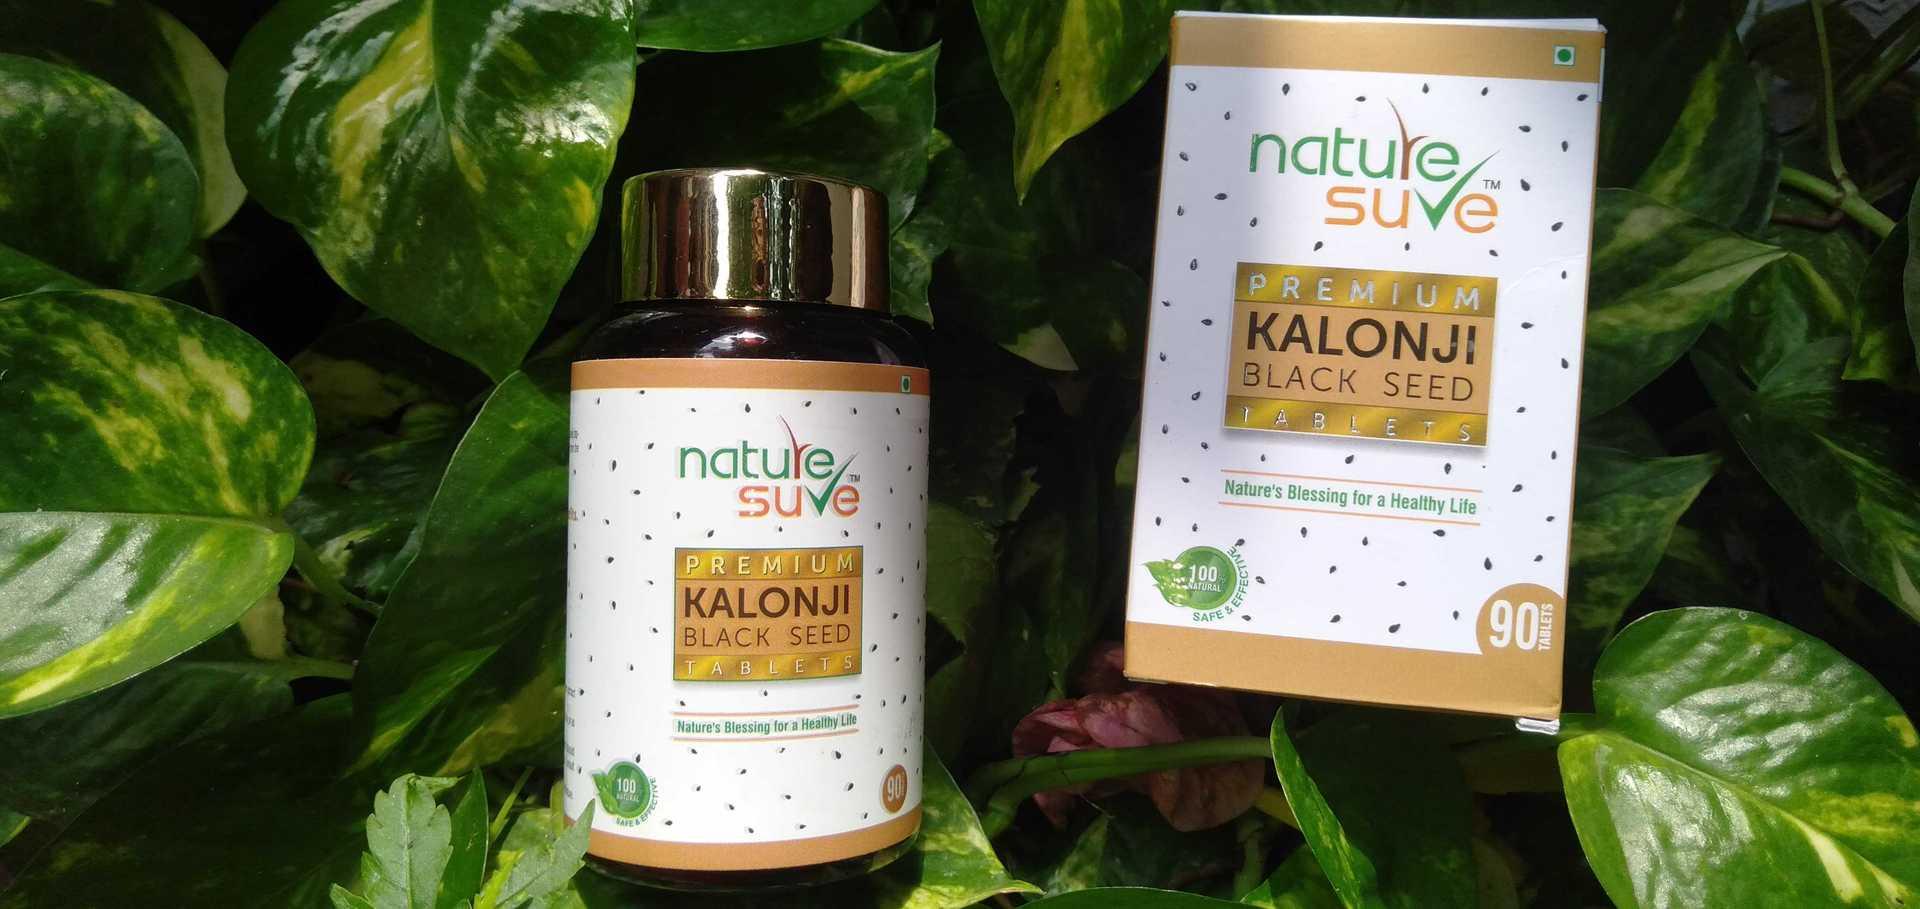 Nature sure - Kalonji tablet image